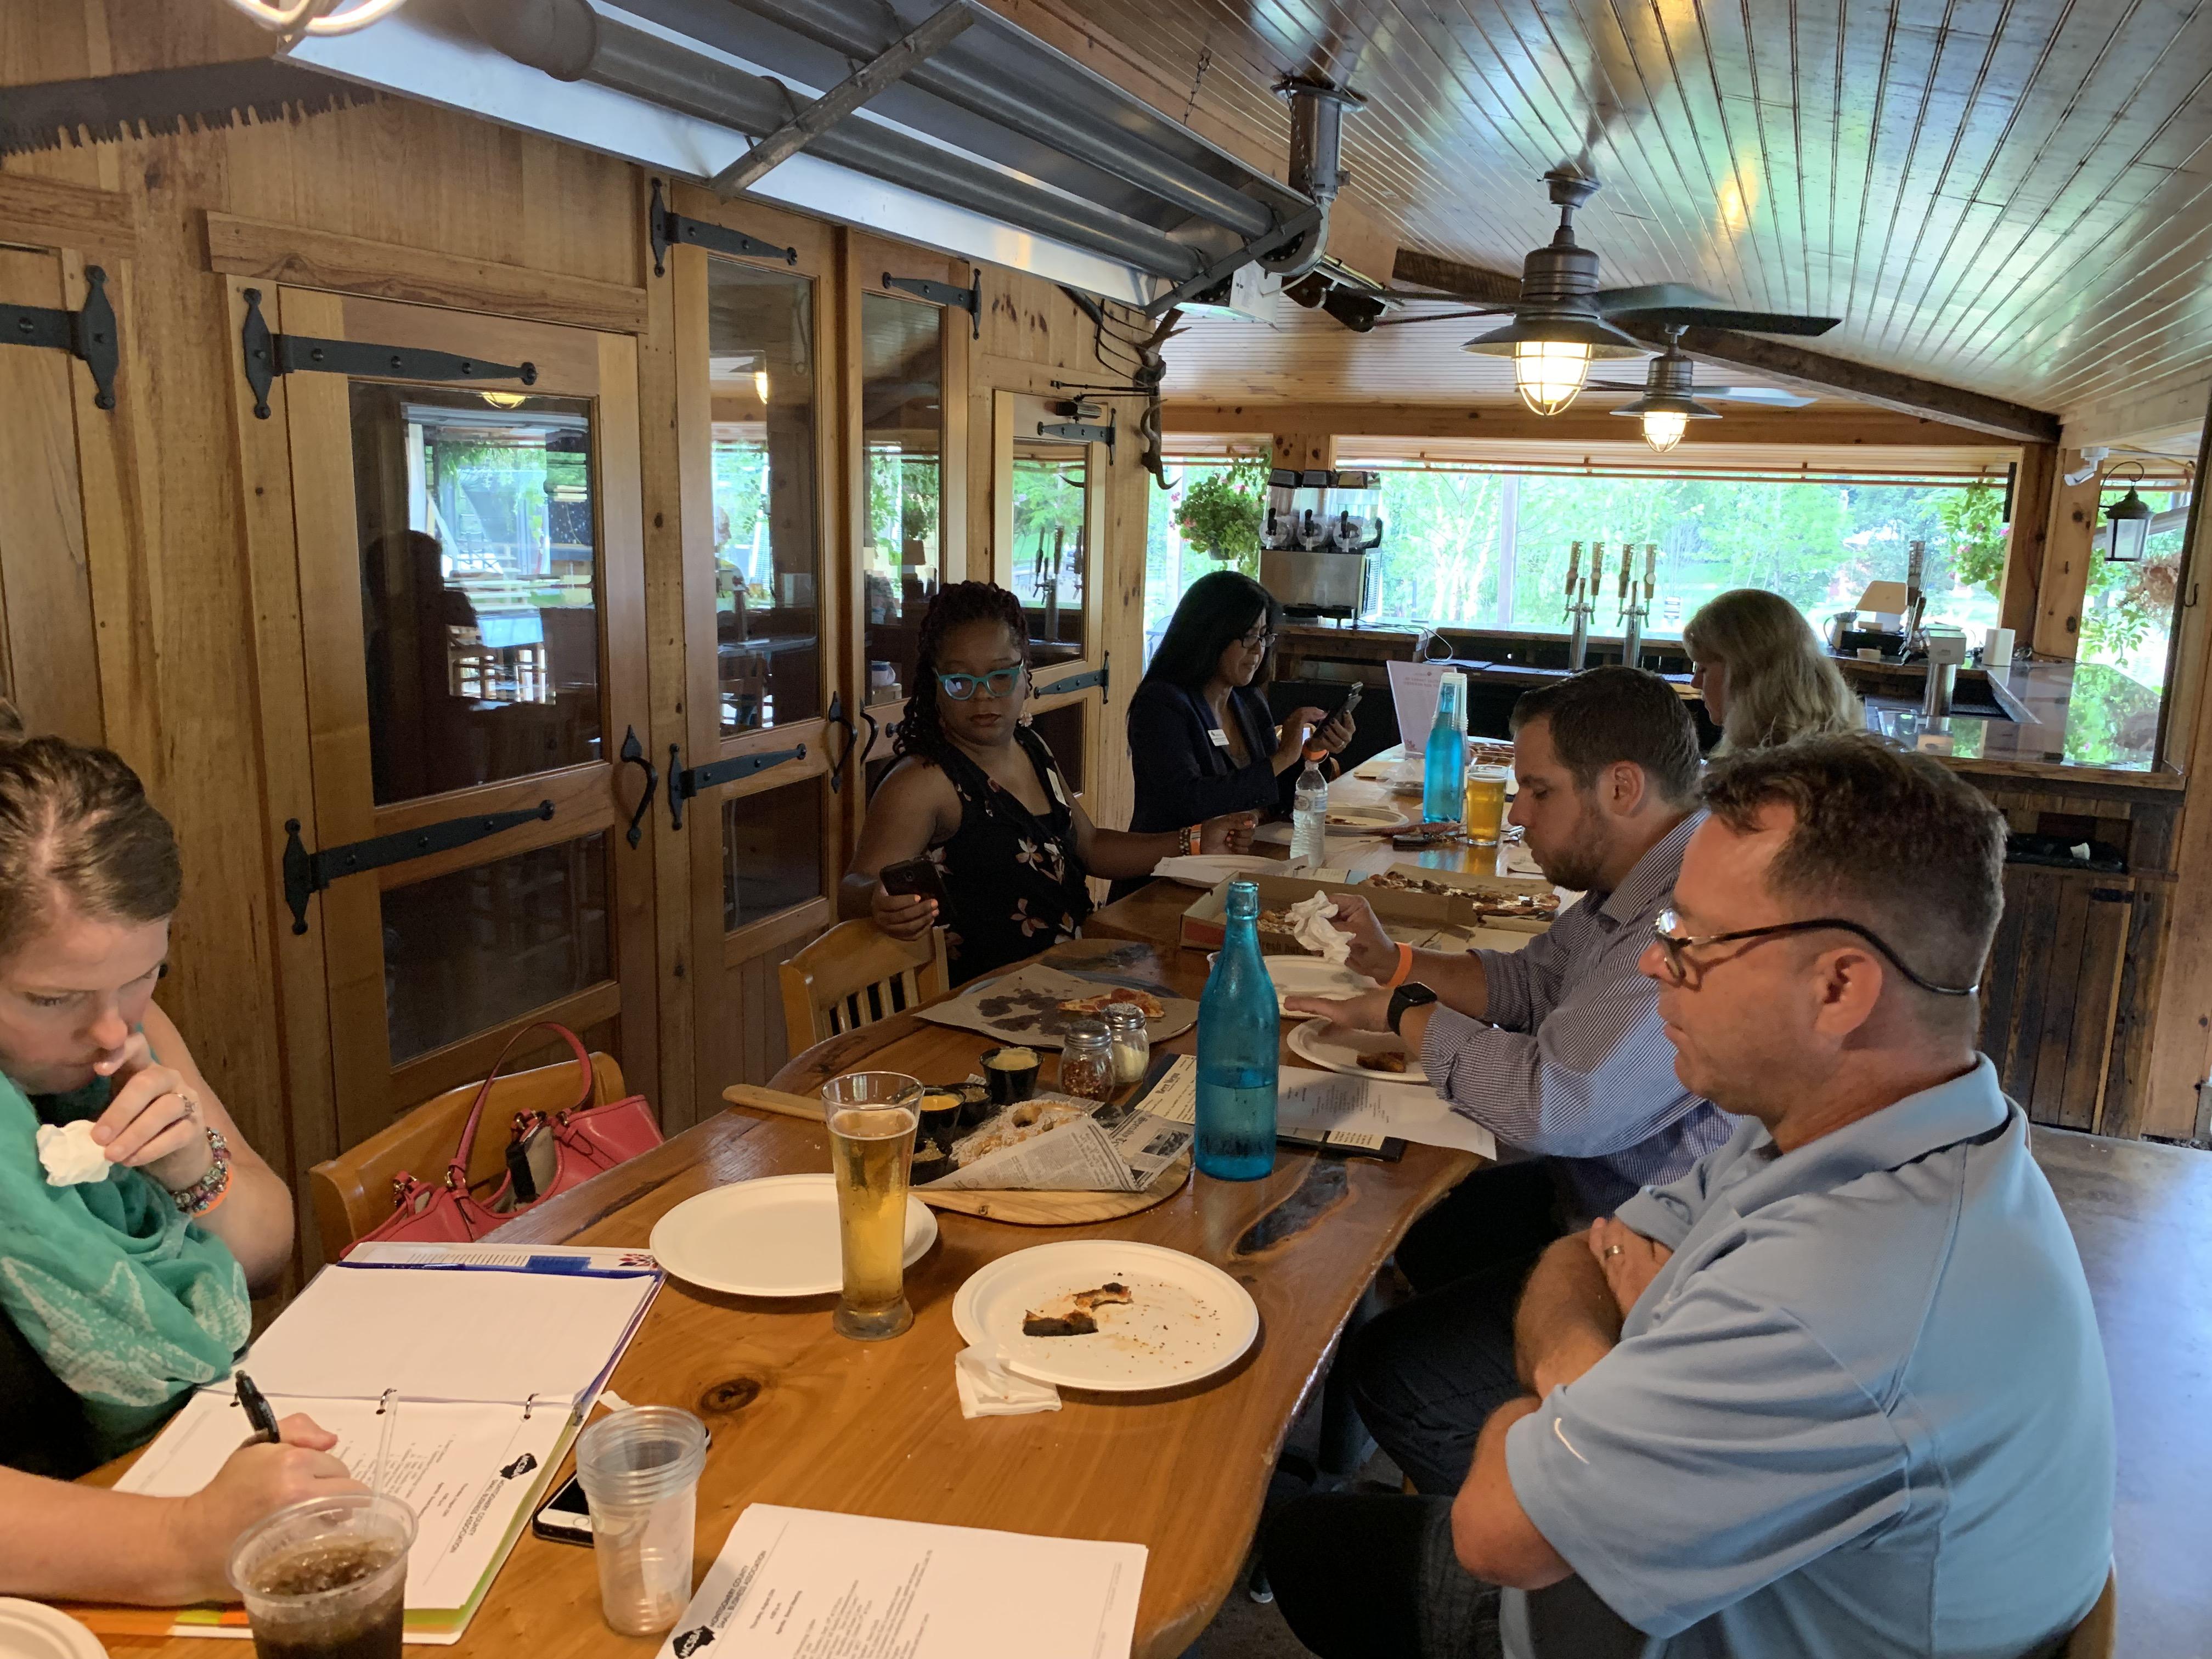 Summer Networking 08/15/2019